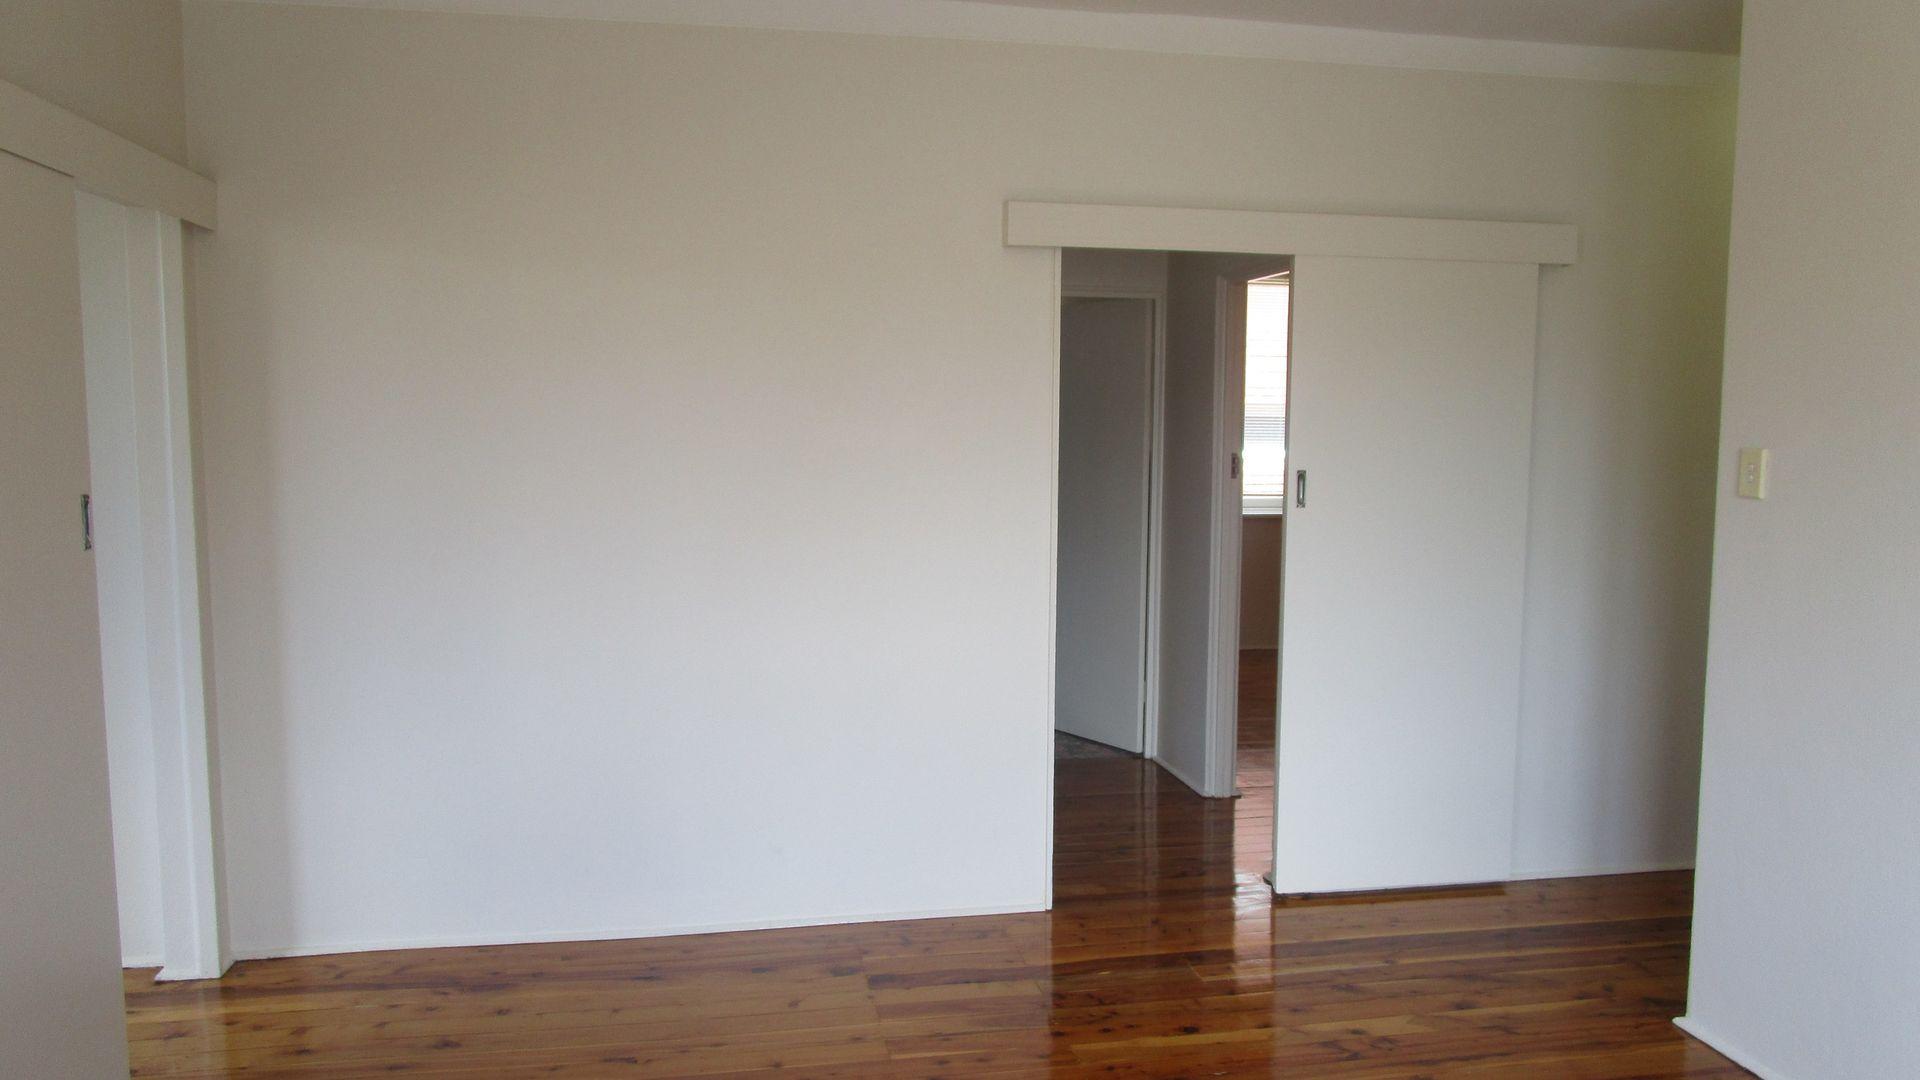 4/10 Elsmere Street, Kensington NSW 2033, Image 1